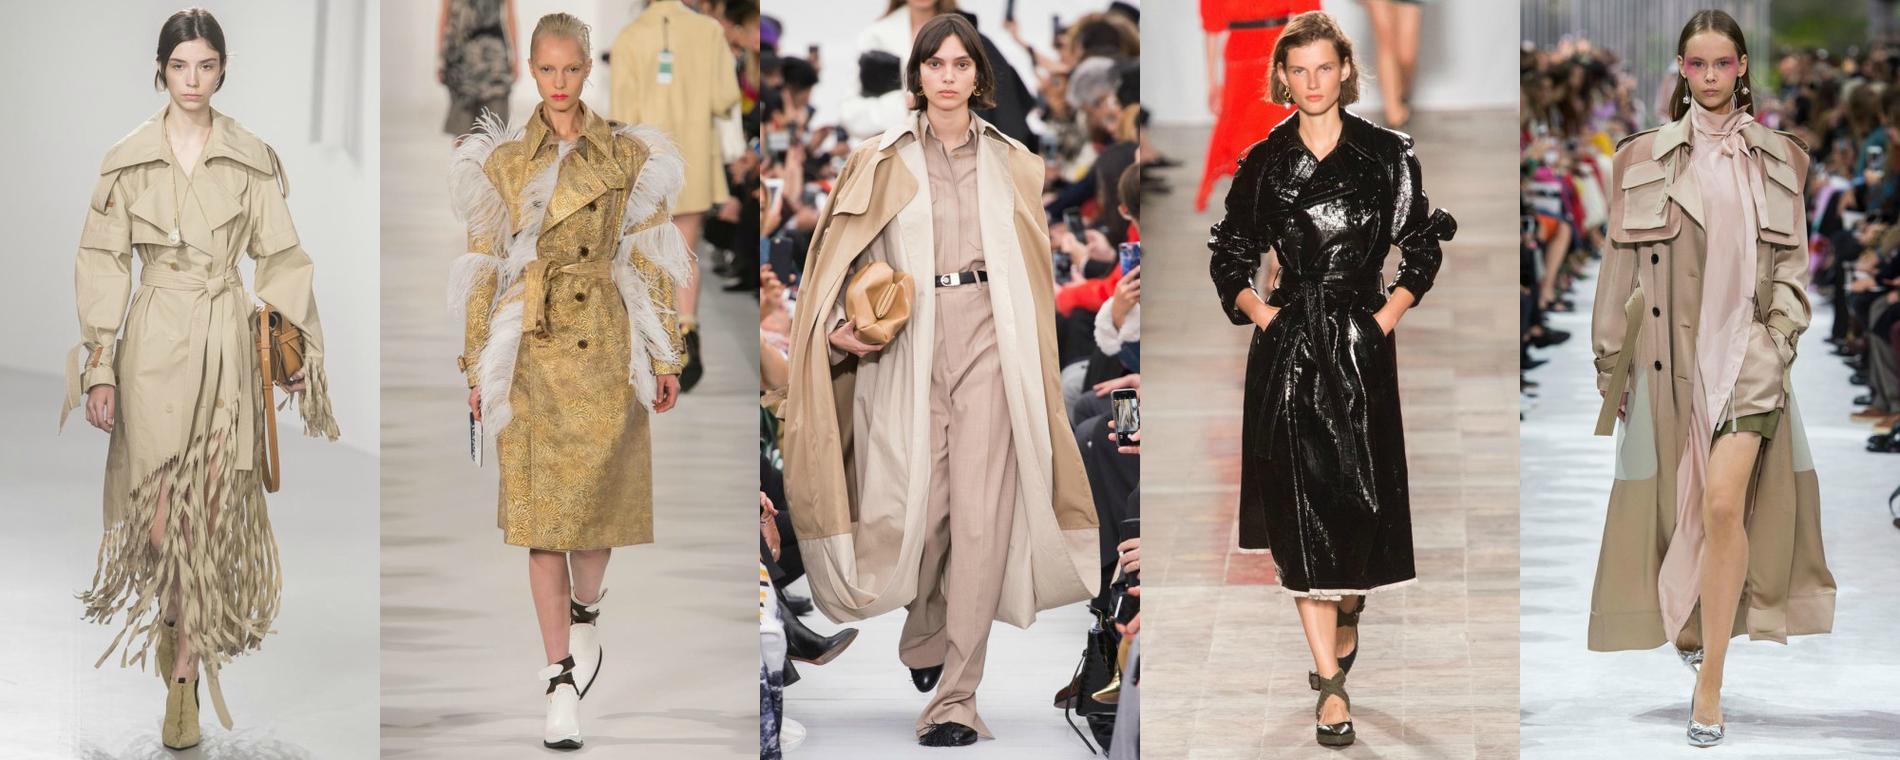 les dix tendances rep r es lors de la fashion week printemps t 2018 madame figaro. Black Bedroom Furniture Sets. Home Design Ideas